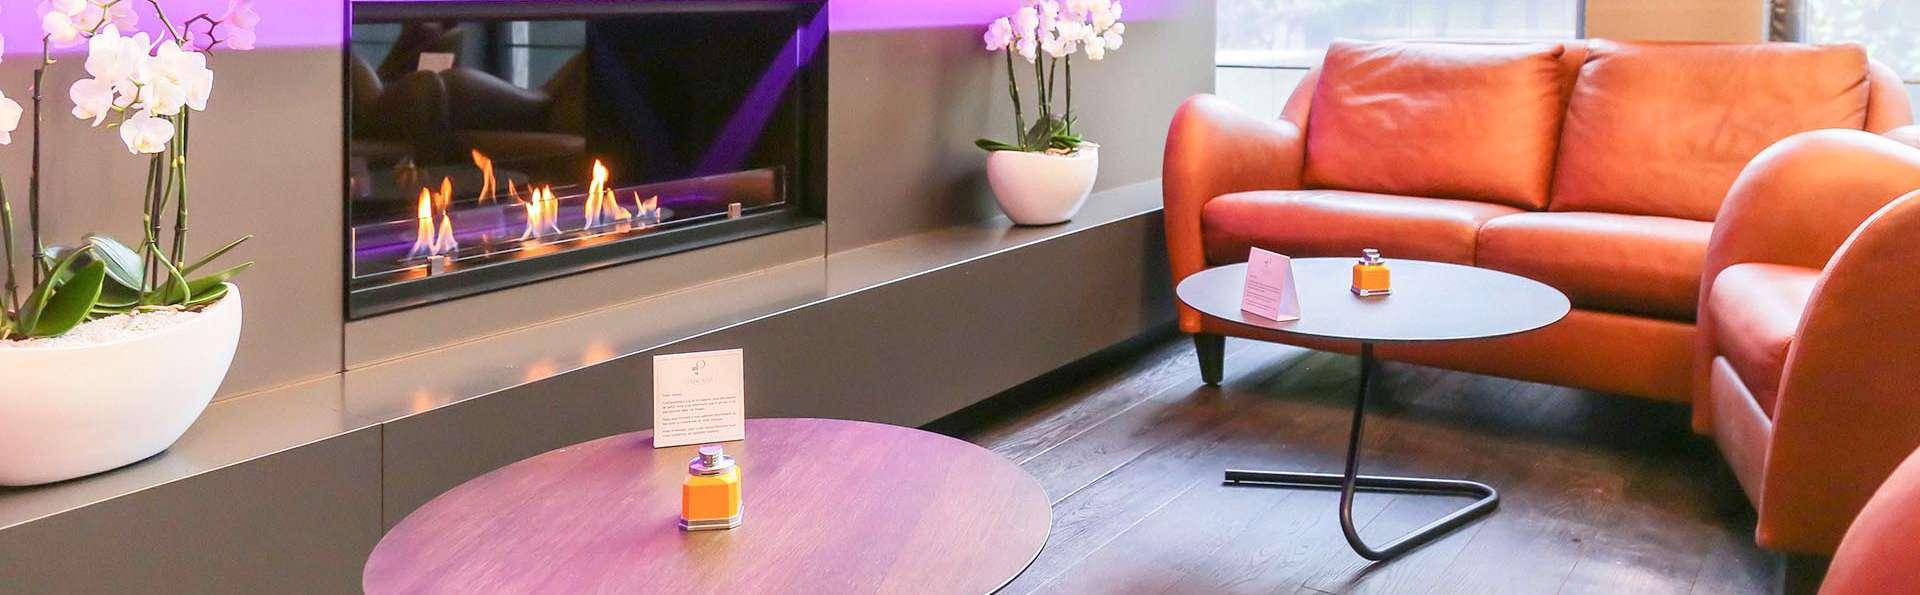 Le Royal Hotels & Resorts - EDIT_LOUNGE_01.jpg